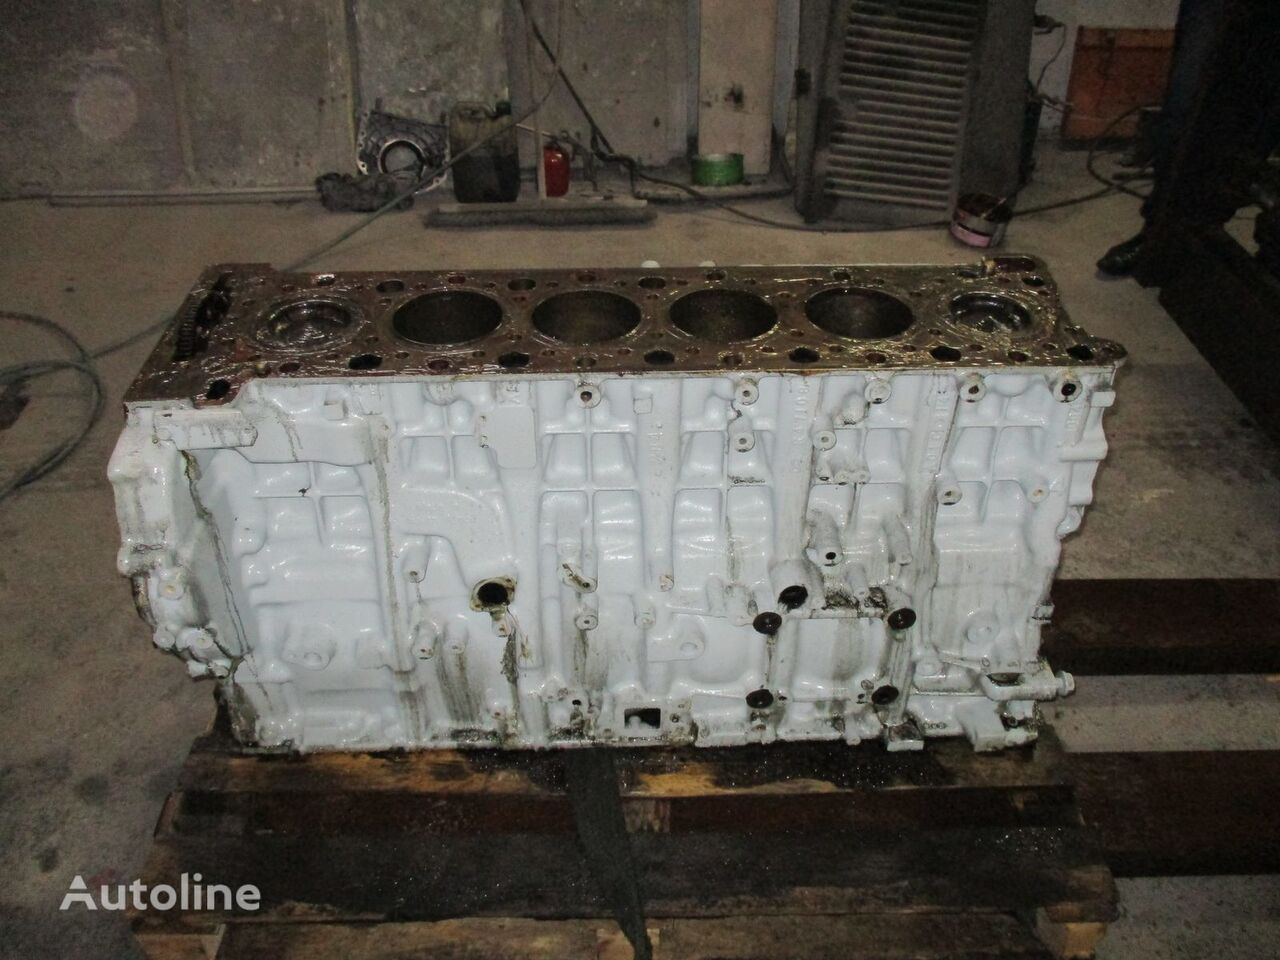 MERCEDES-BENZ Actros MP4, EURO 5, EURO 6 emission cylinder block, short block, blok cilindara za MERCEDES-BENZ Actros MP4 tegljača